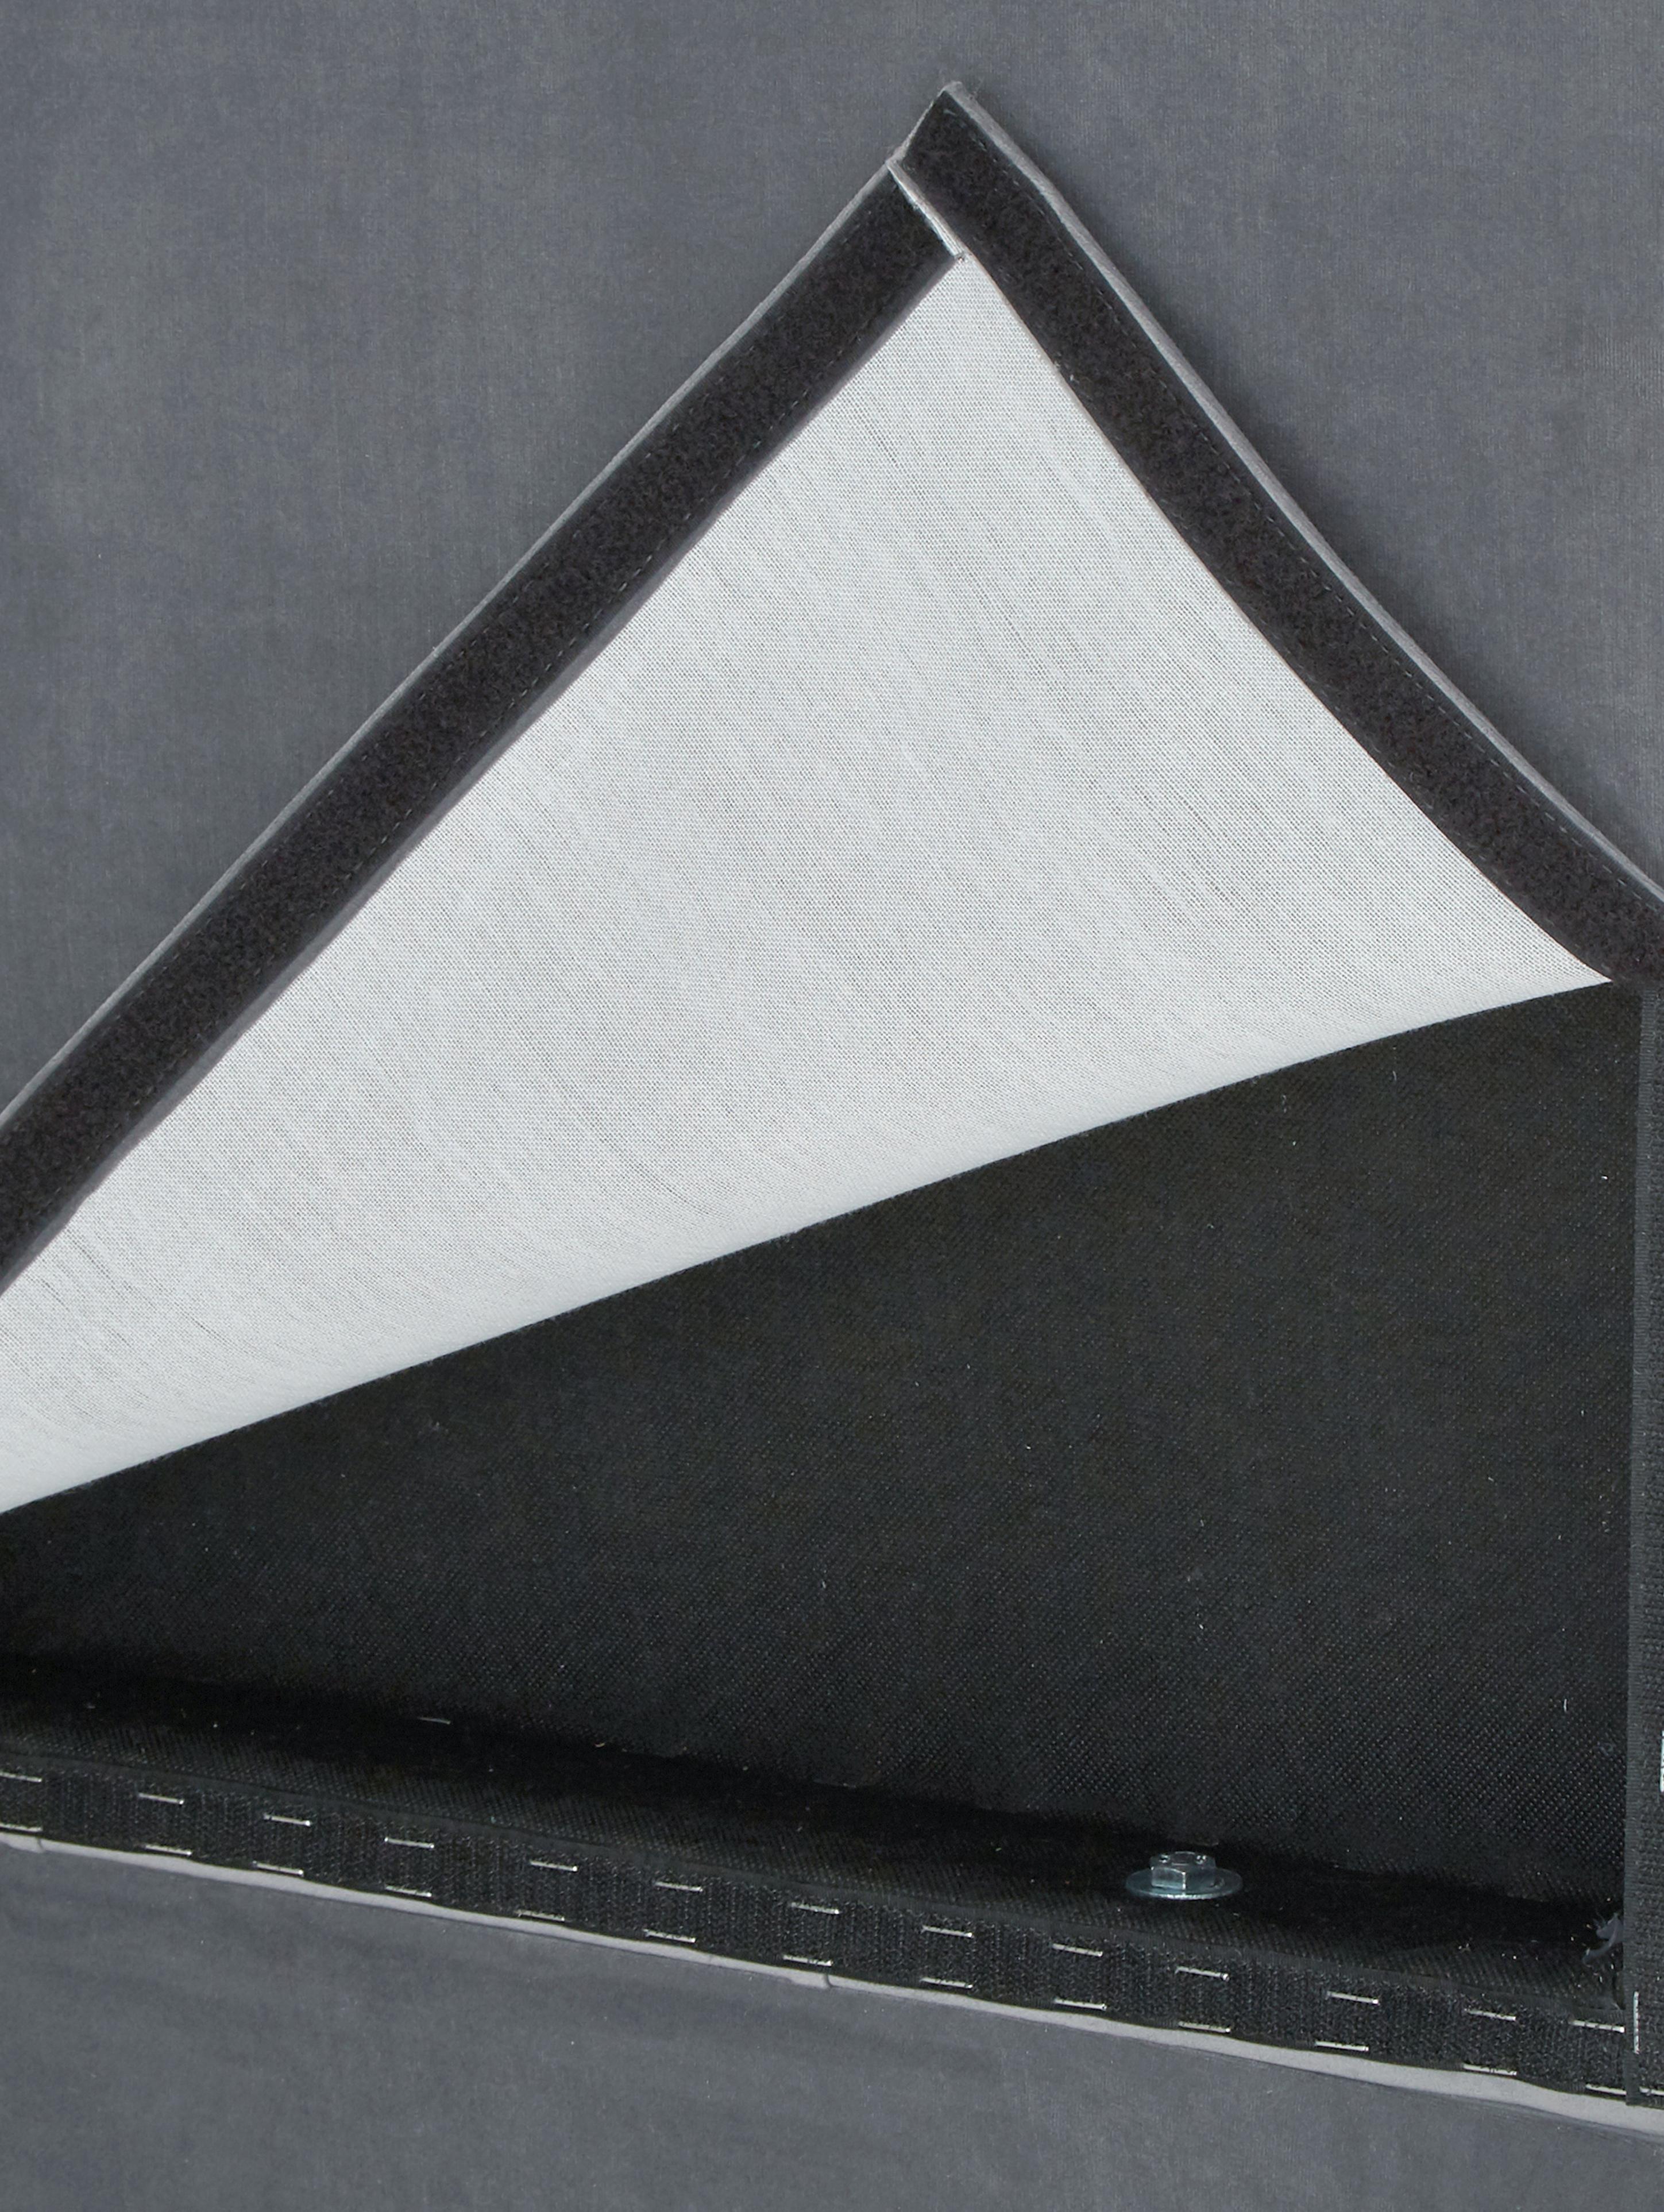 Premium Samt-Boxspringbett Phoebe, Matratze: 7-Zonen-Taschenfederkern , Füße: Massives Buchenholz, lack, Dunkelgrau, 200 x 200 cm